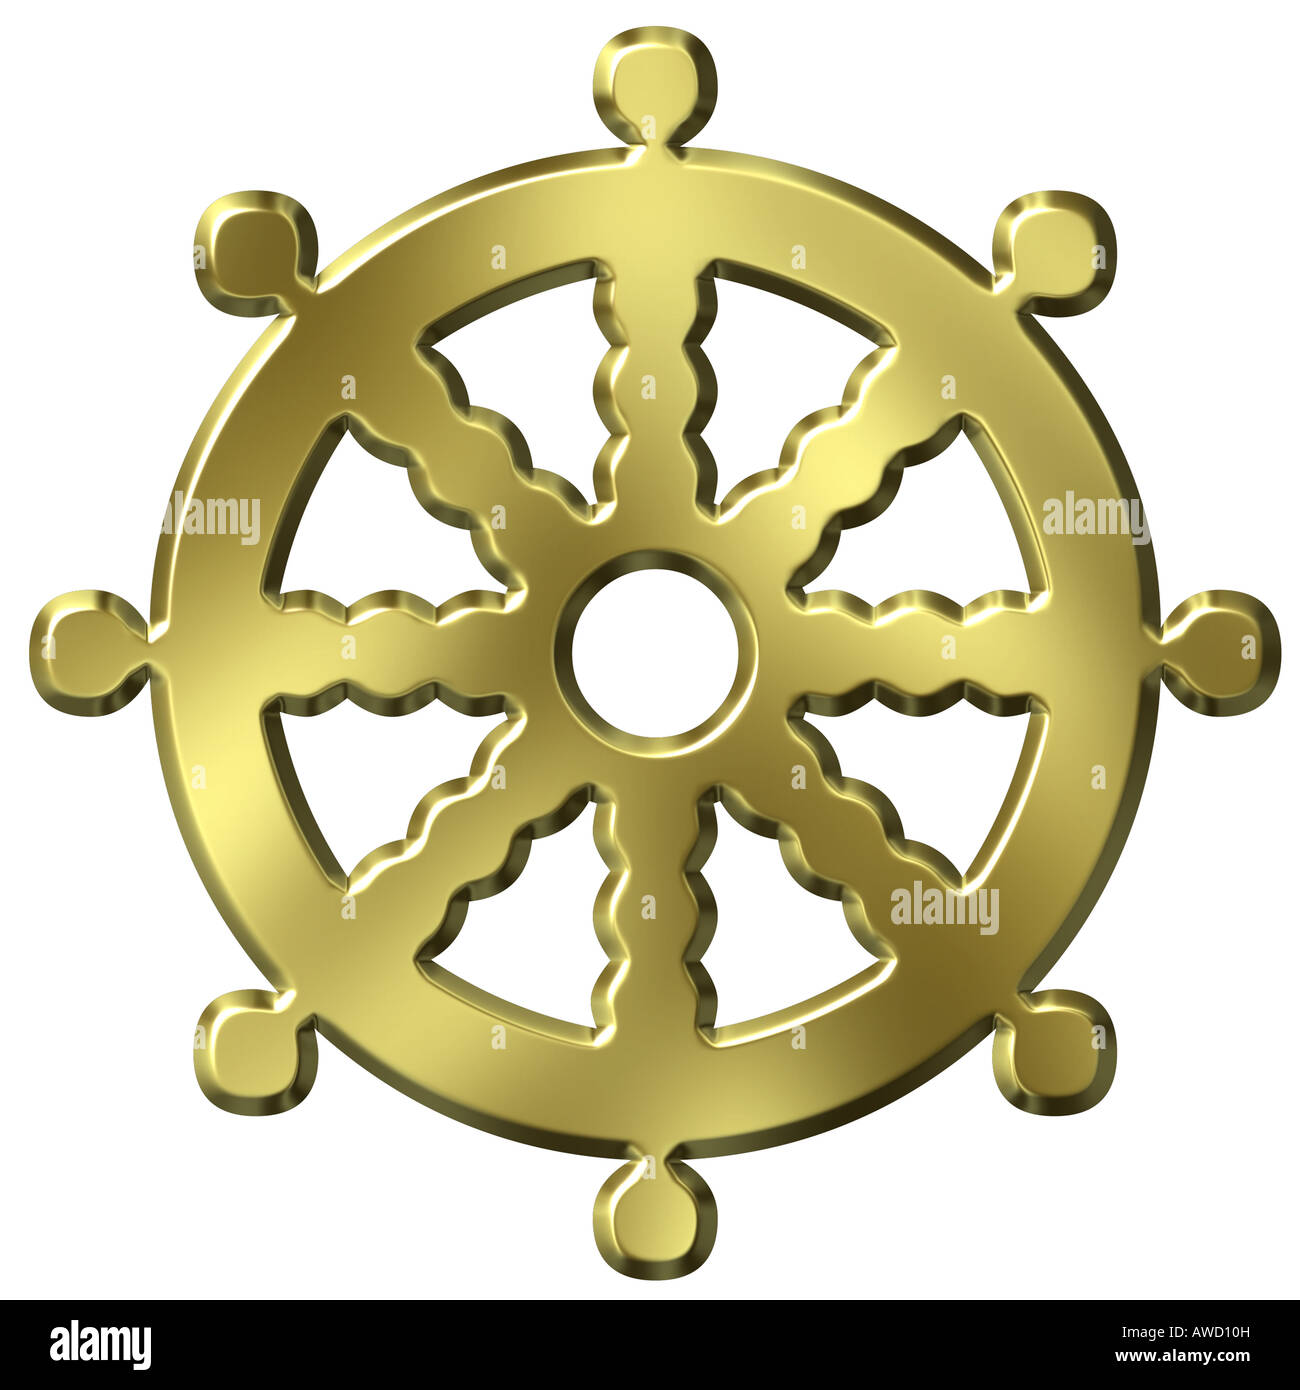 3d golden buddhism symbol wheel of life - Stock Image